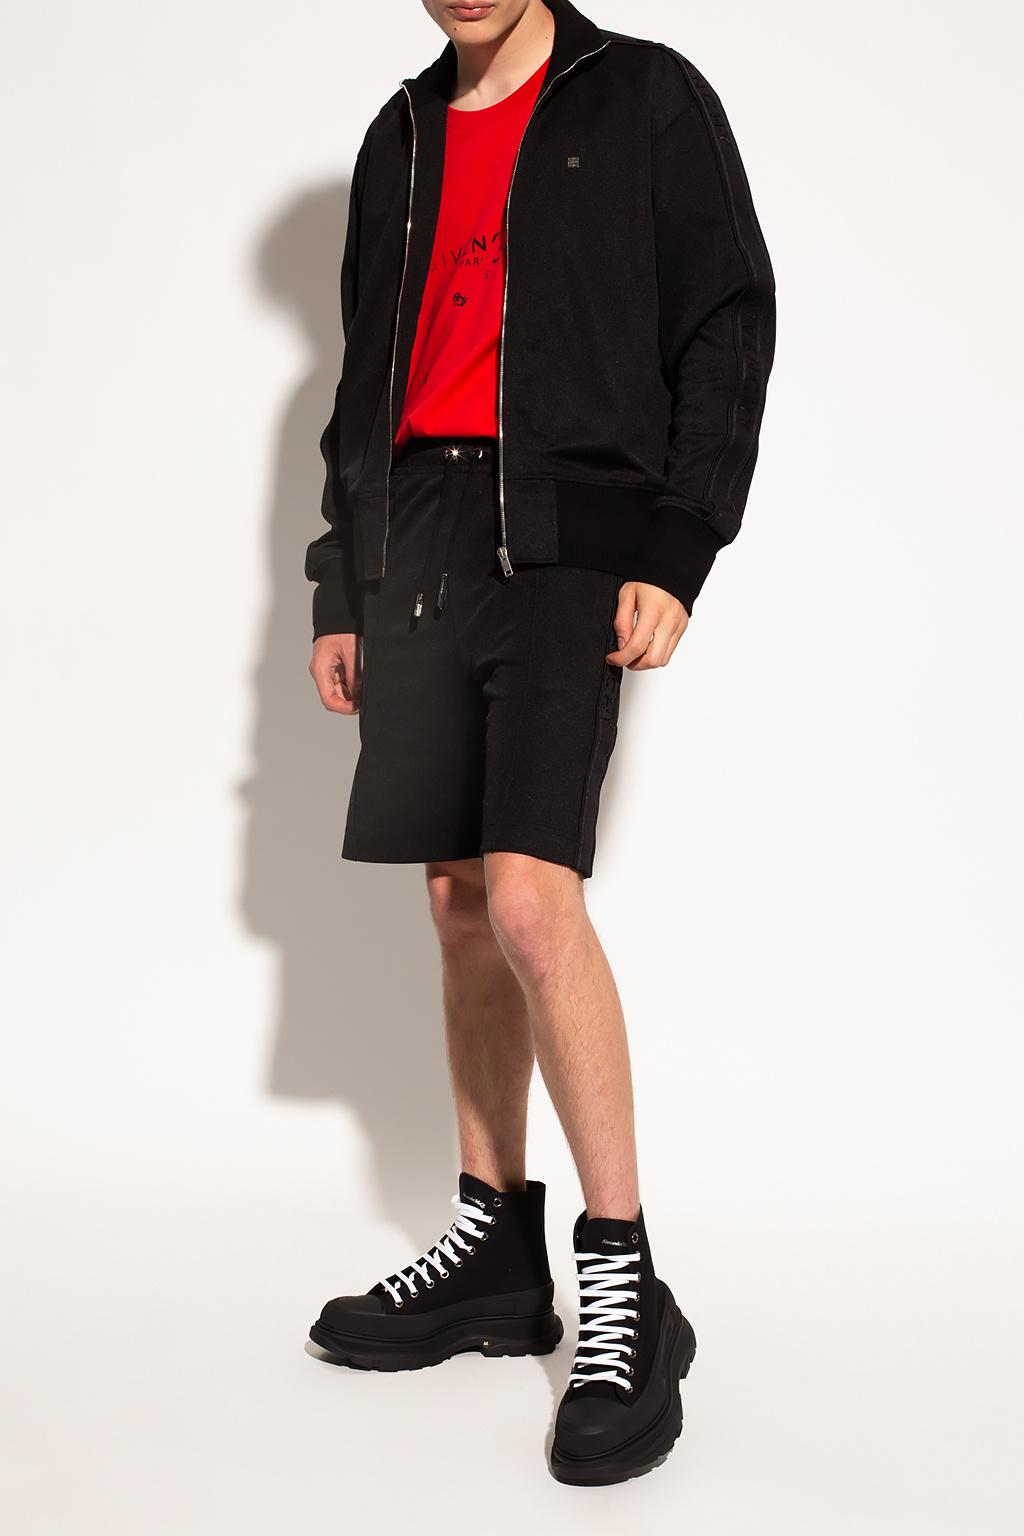 Givenchy Shorts with logo